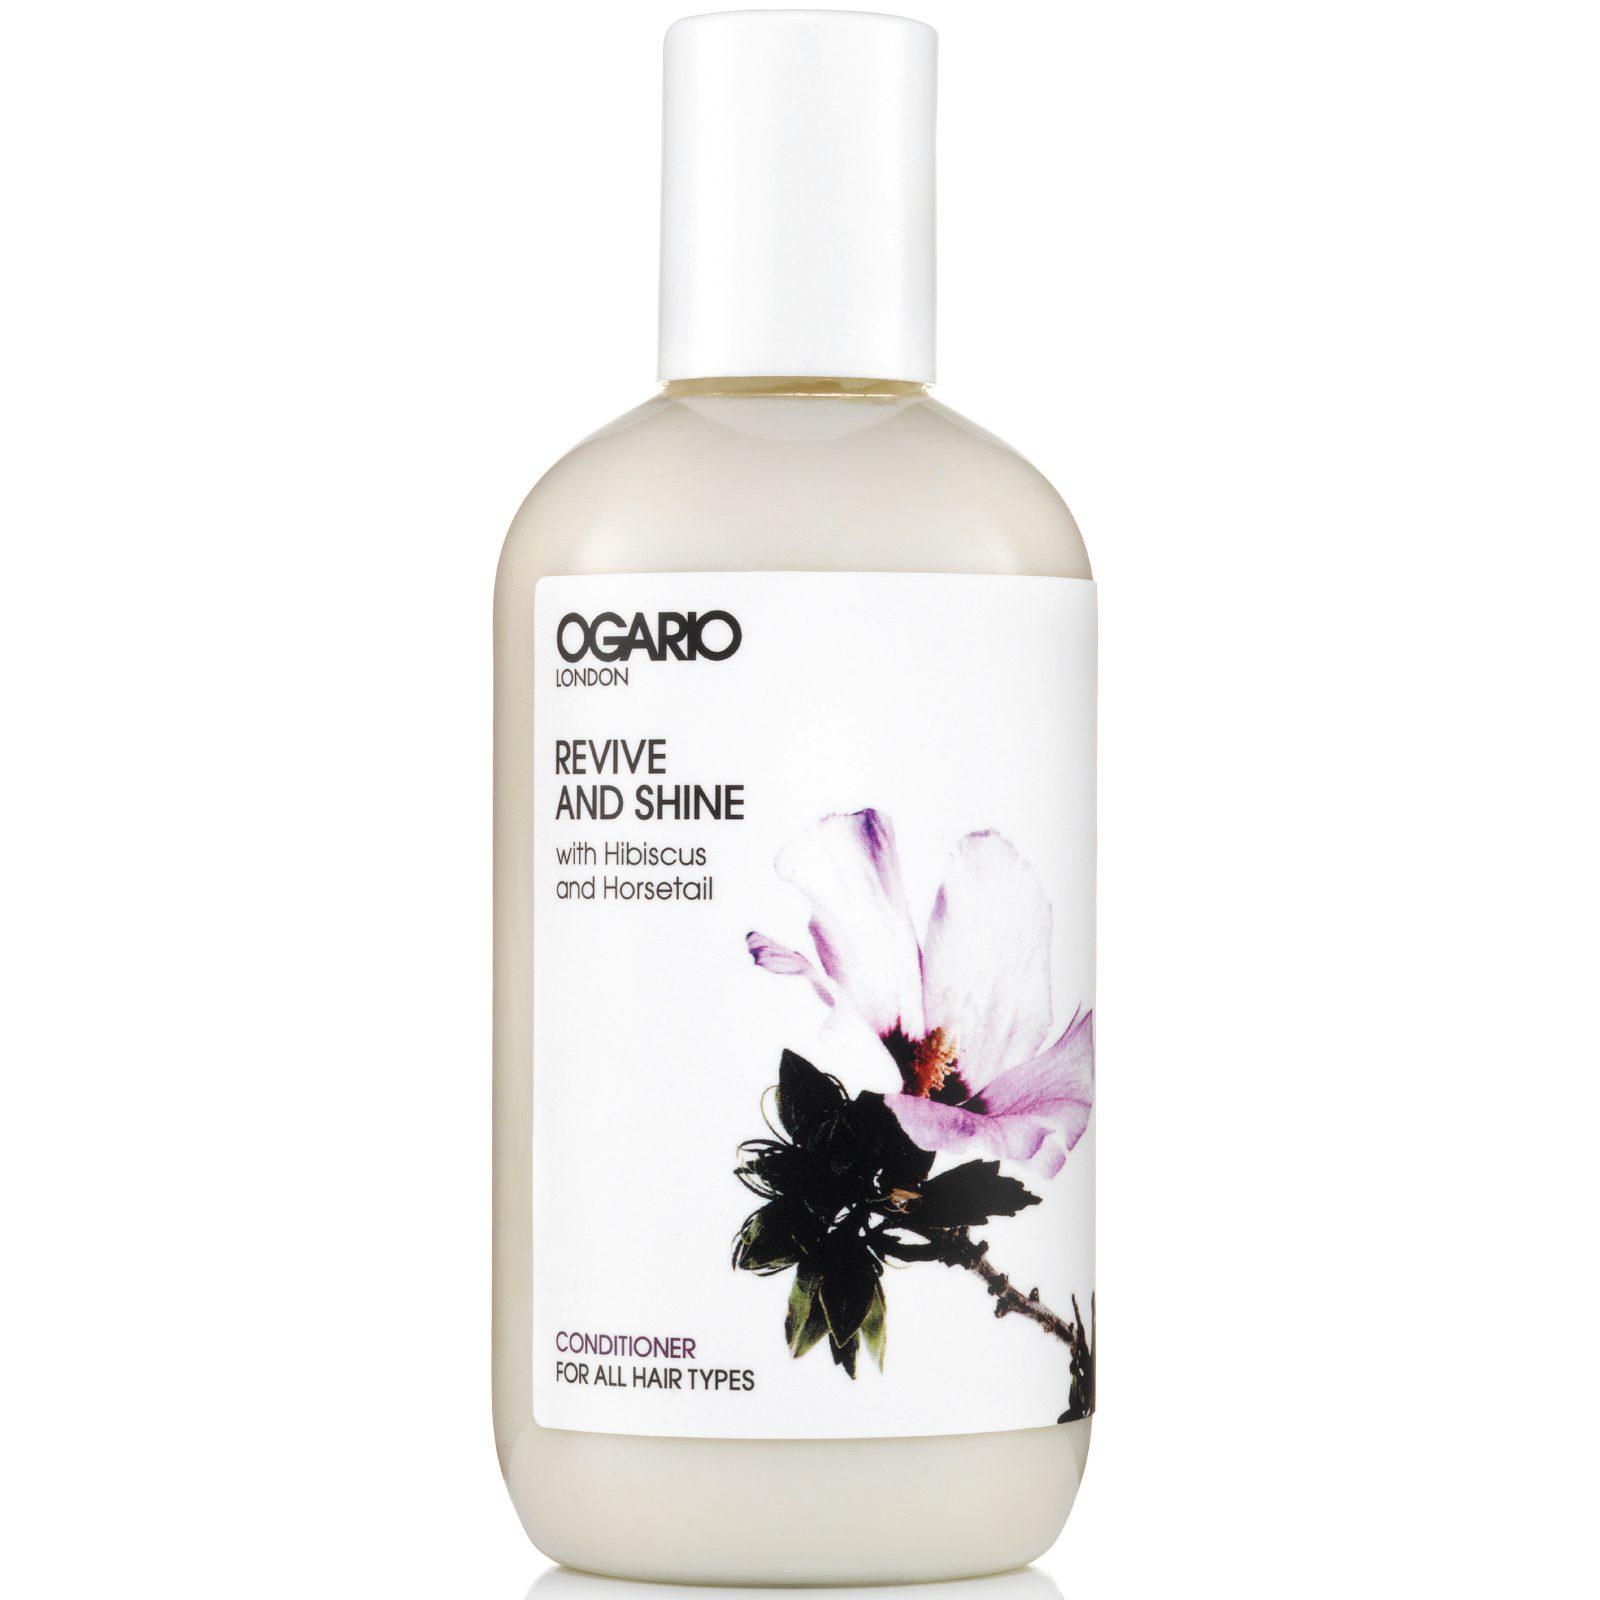 OGARIO Revive and Shine Conditioner for all hair types; prep fine hair for styling, detangler